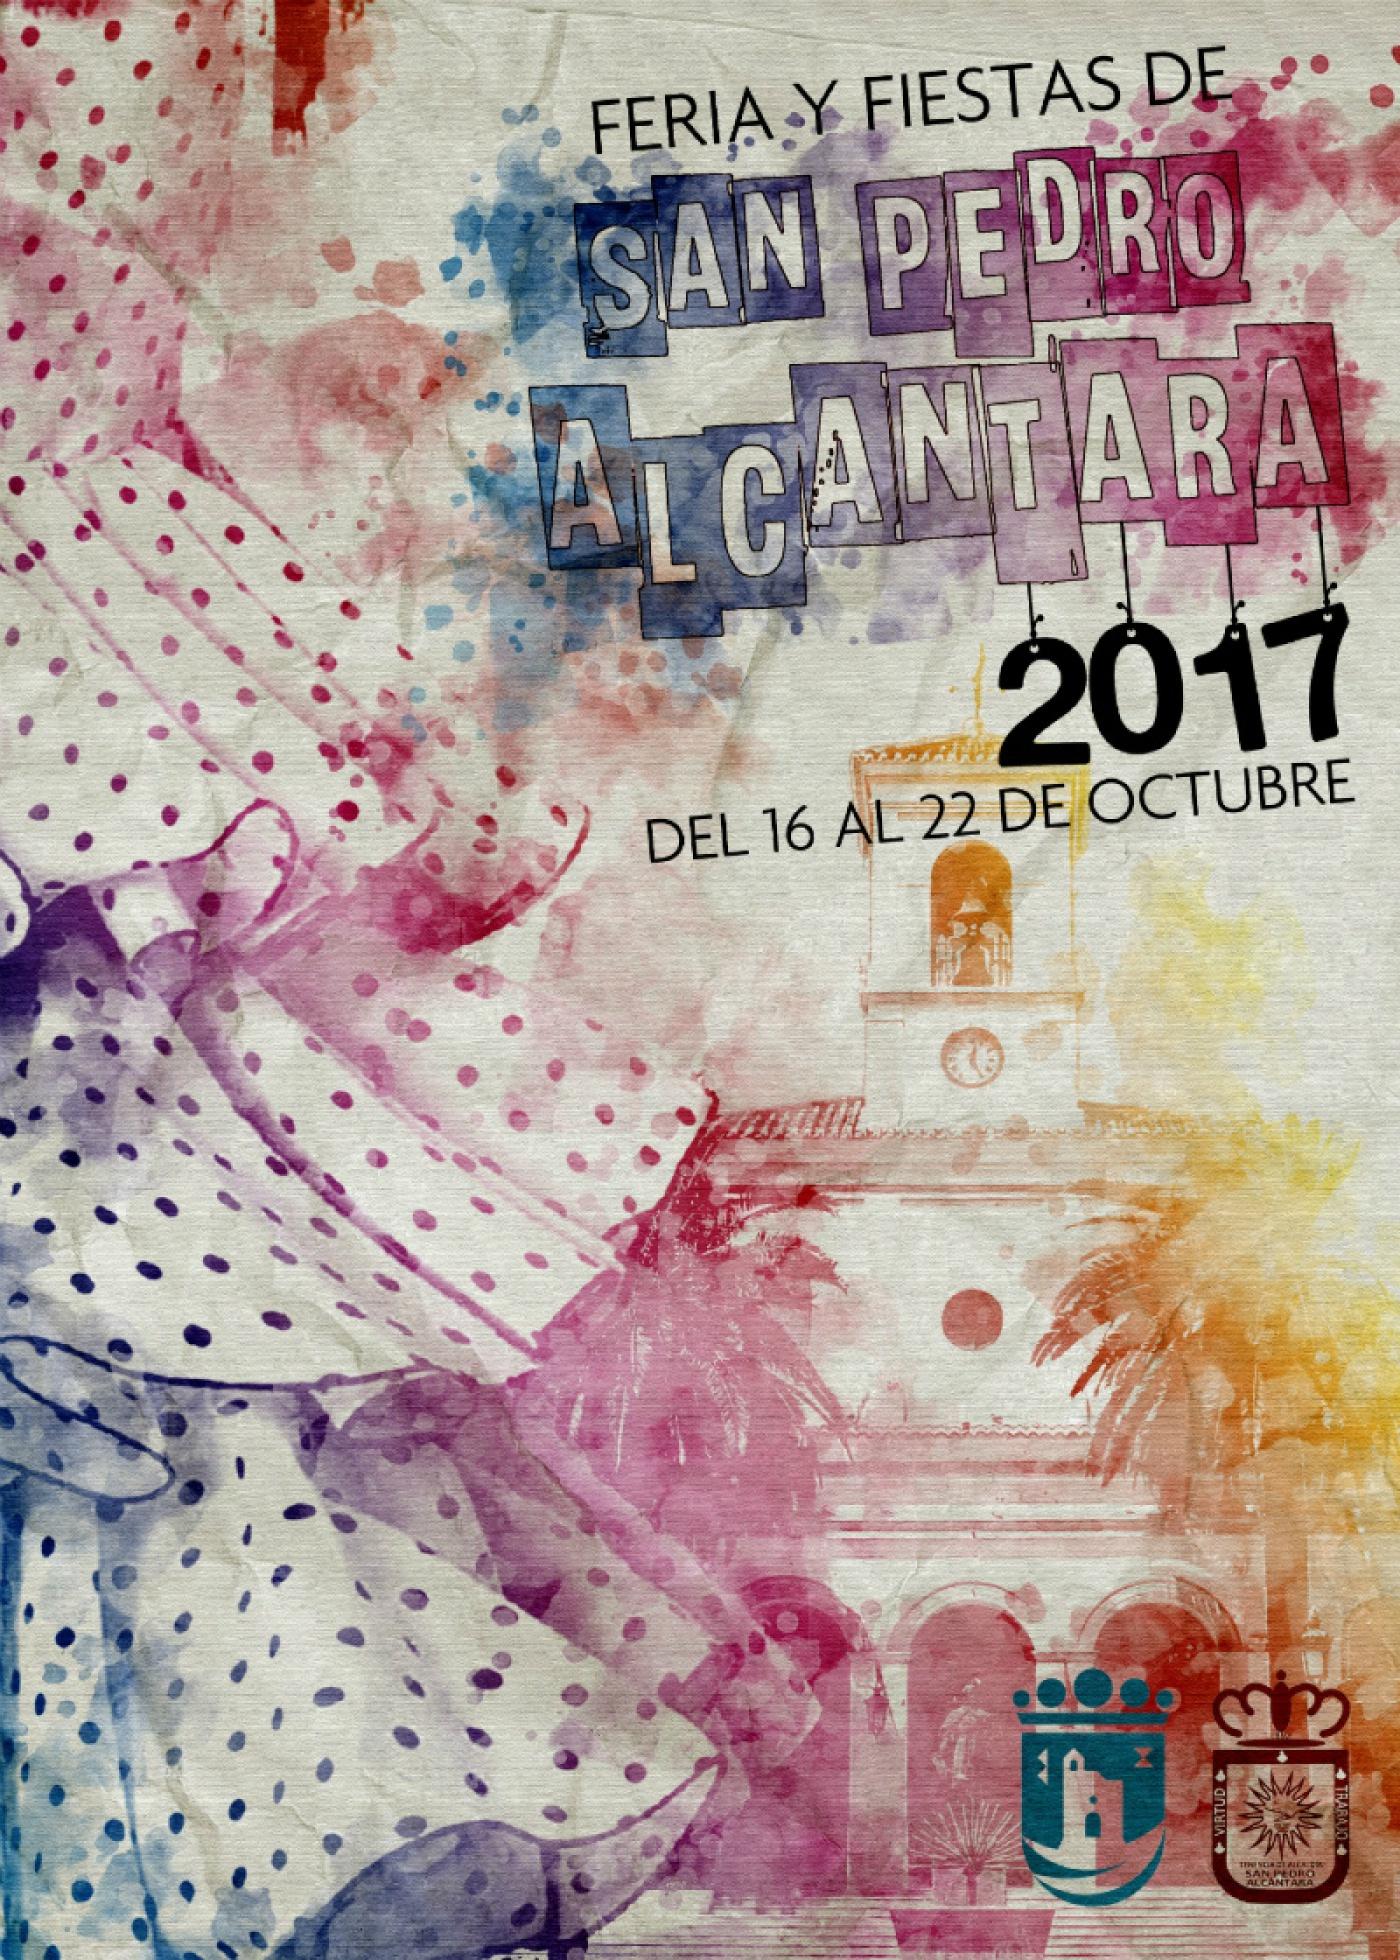 Feria San Pedro Alcantara 2017 - Centro Plaza